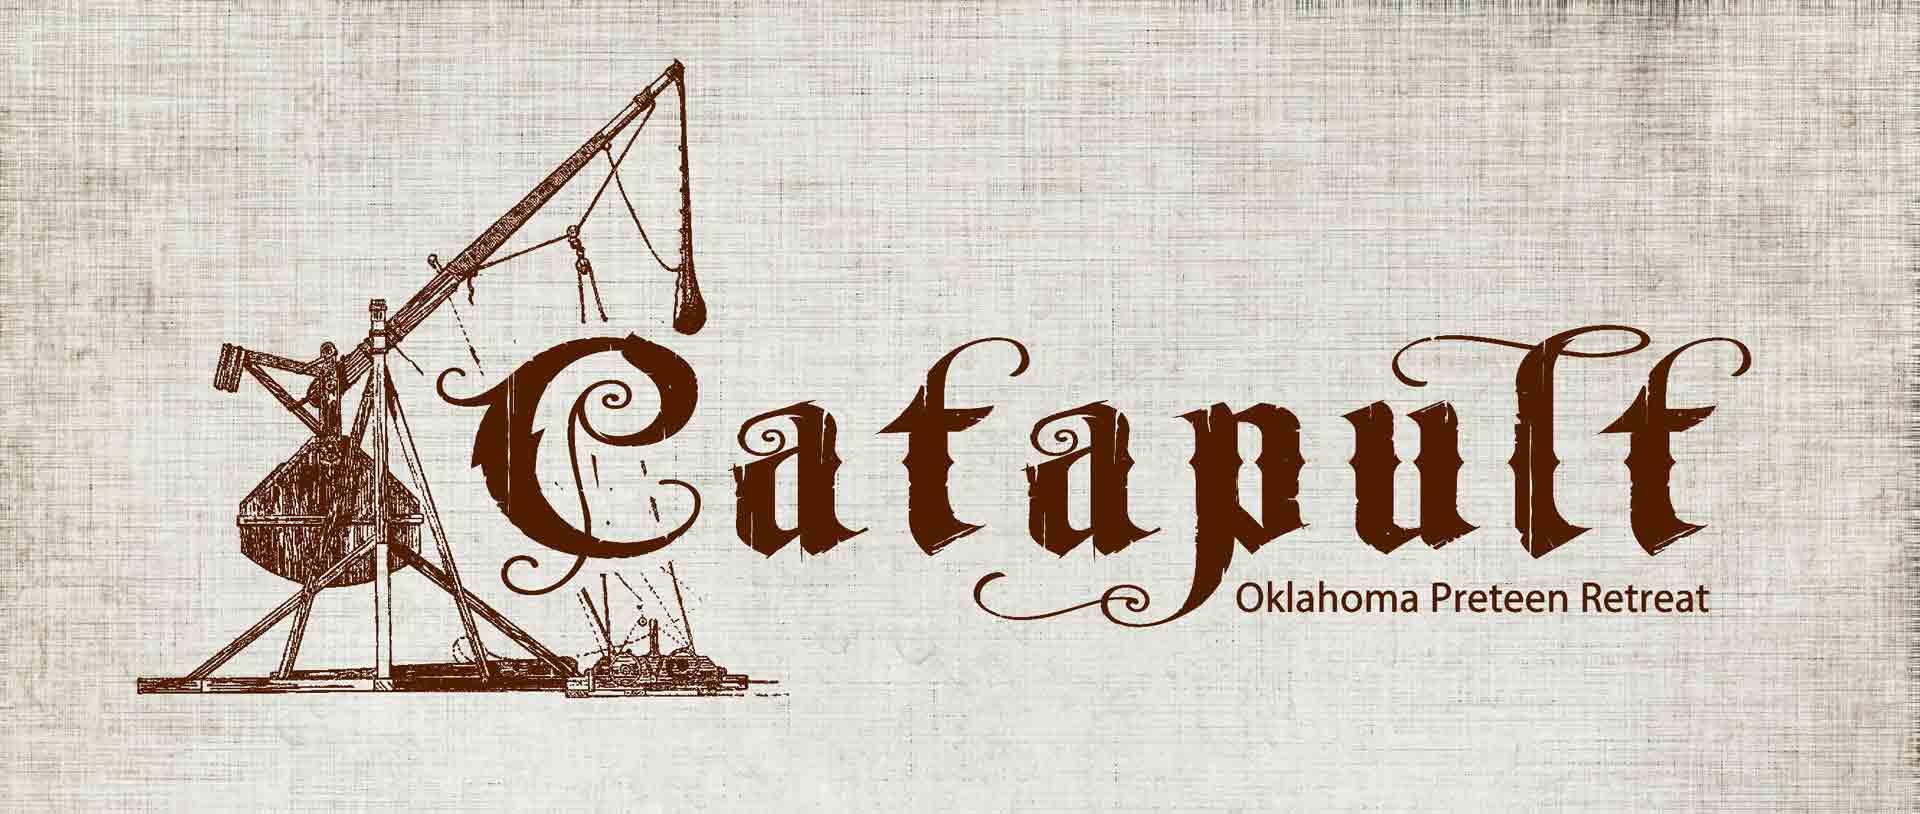 Catapult Oklahoma Pretten Retreat